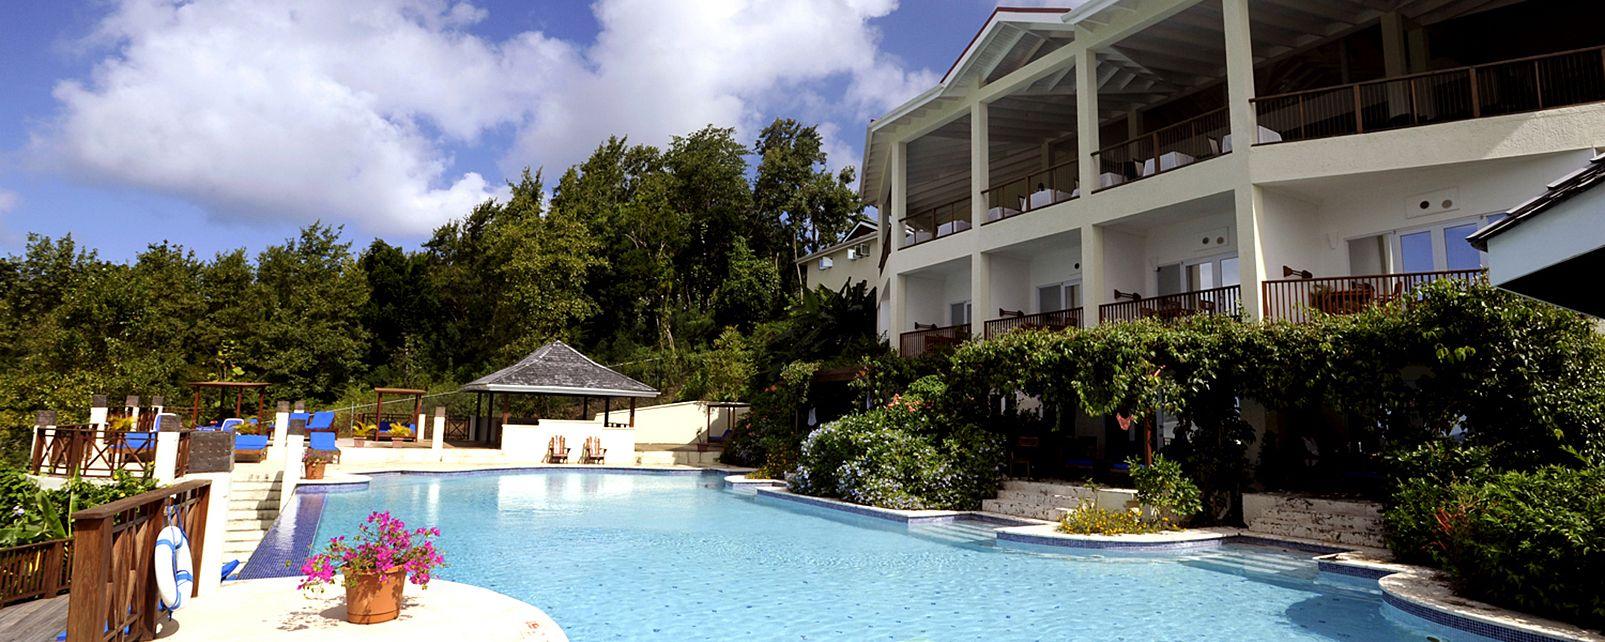 Hôtel Calabash Cove